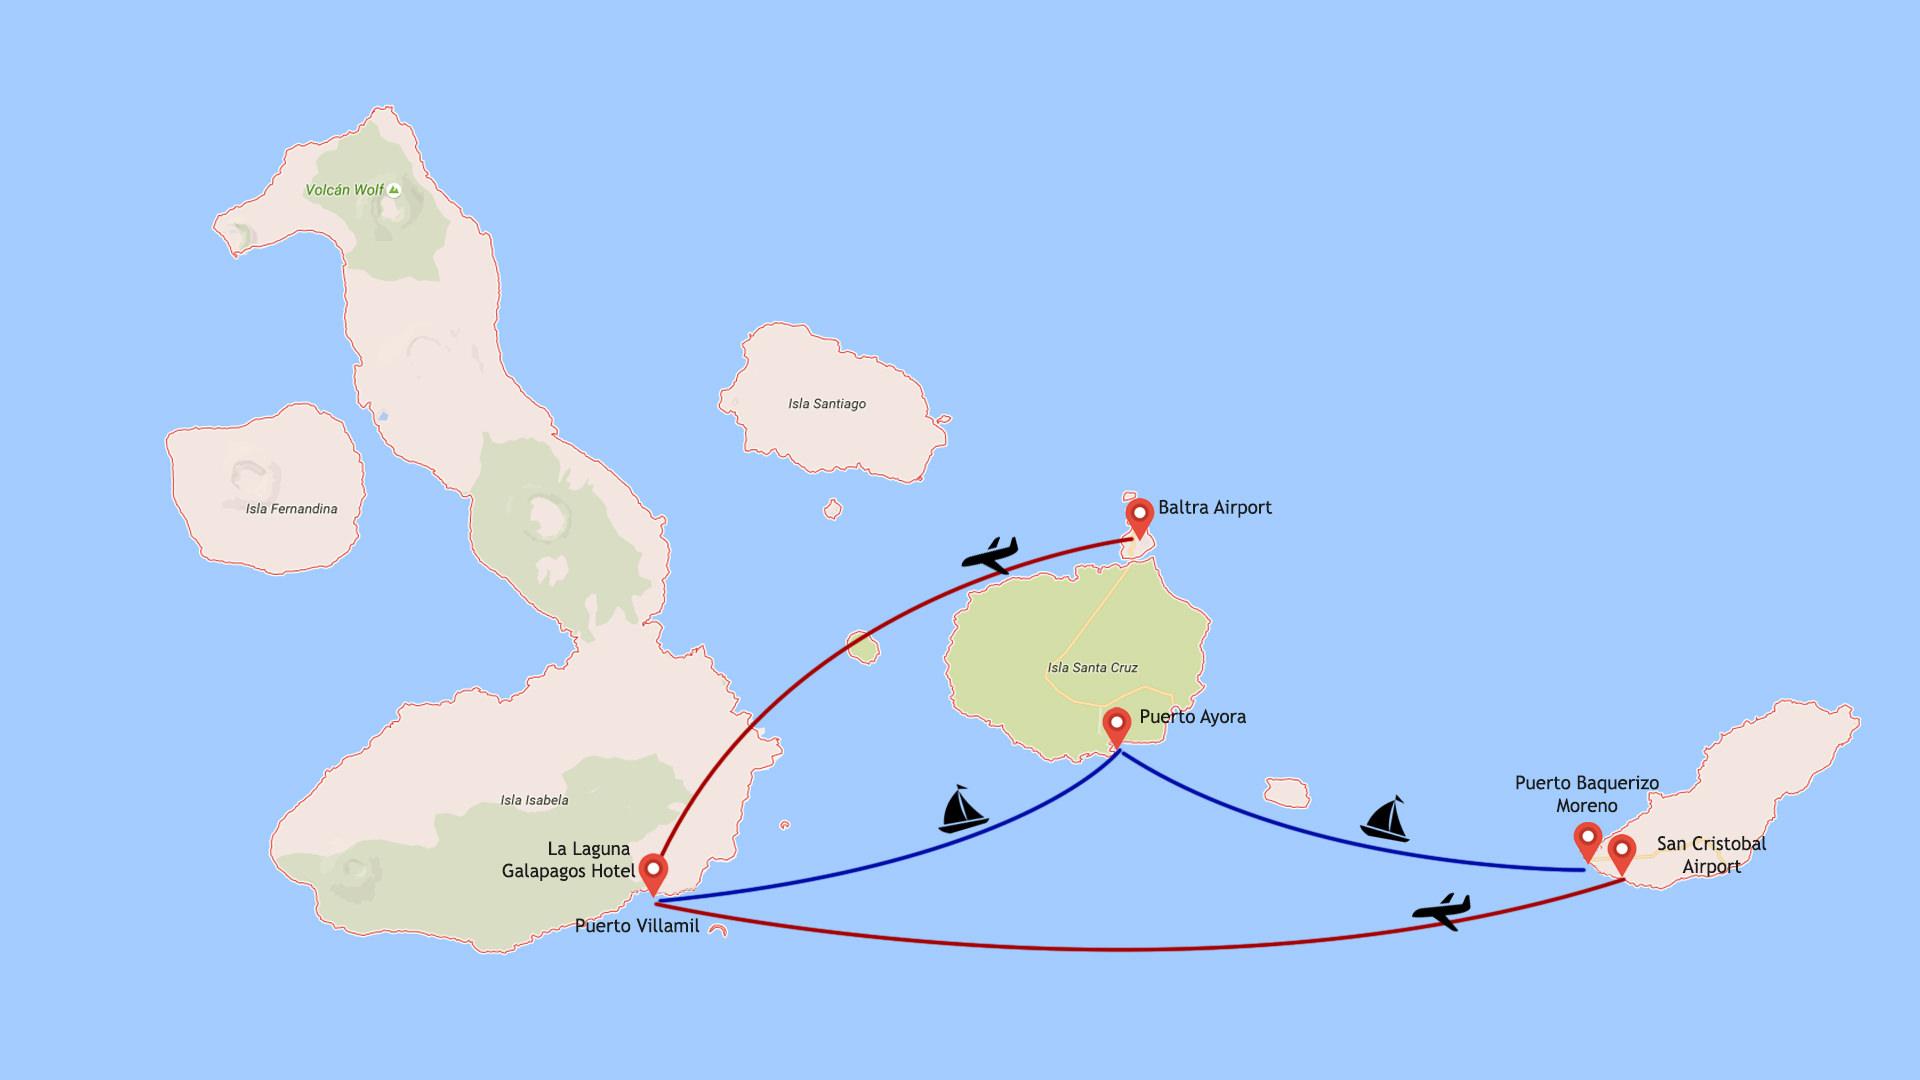 Galapagos-Islands-Location-Map | San Vicente Galapagos Hotel on caribbean map, maldives map, central america map, genovesa island, luxembourg map, pinta island, honduras map, puerto ayora map, madagascar map, nameless island, bahamas map, africa map, puerto ayora, bay of fundy, atacama map, ha long bay, baltra island, isabela island, peru map, fernandina island, puerto baquerizo moreno, galapagos national park, tierra del fuego on map, charles darwin research station, netherlands antilles map, greater antilles map, iguazu falls, ethiopia map, cocos islands, strait of magellan map, europe map, dominican republic map, aleutian islands map, iceland islands map,